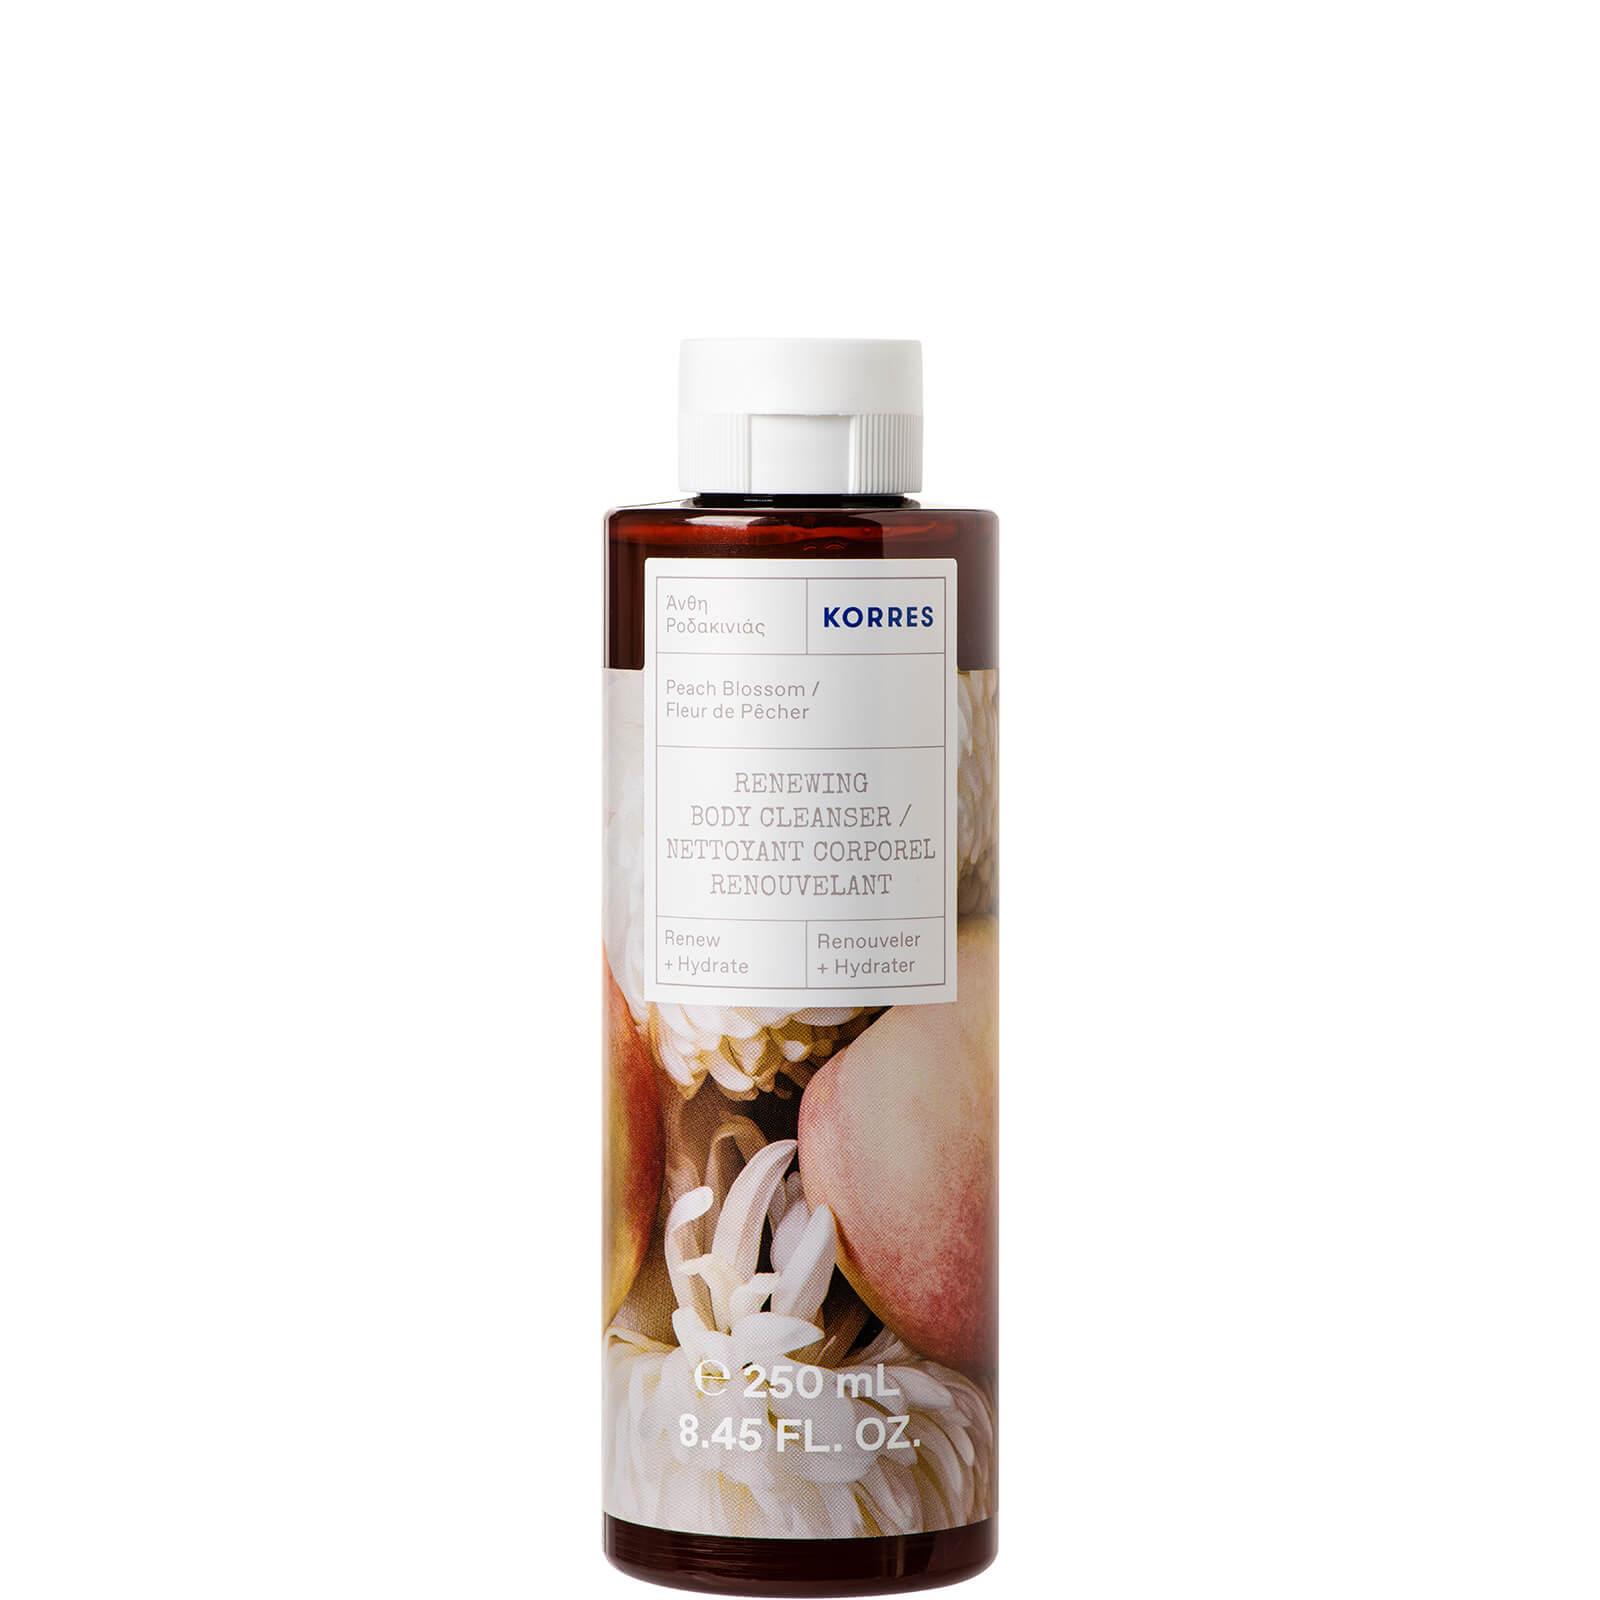 Купить KORRES Peach Blossom Renewing Body Cleanser 250ml